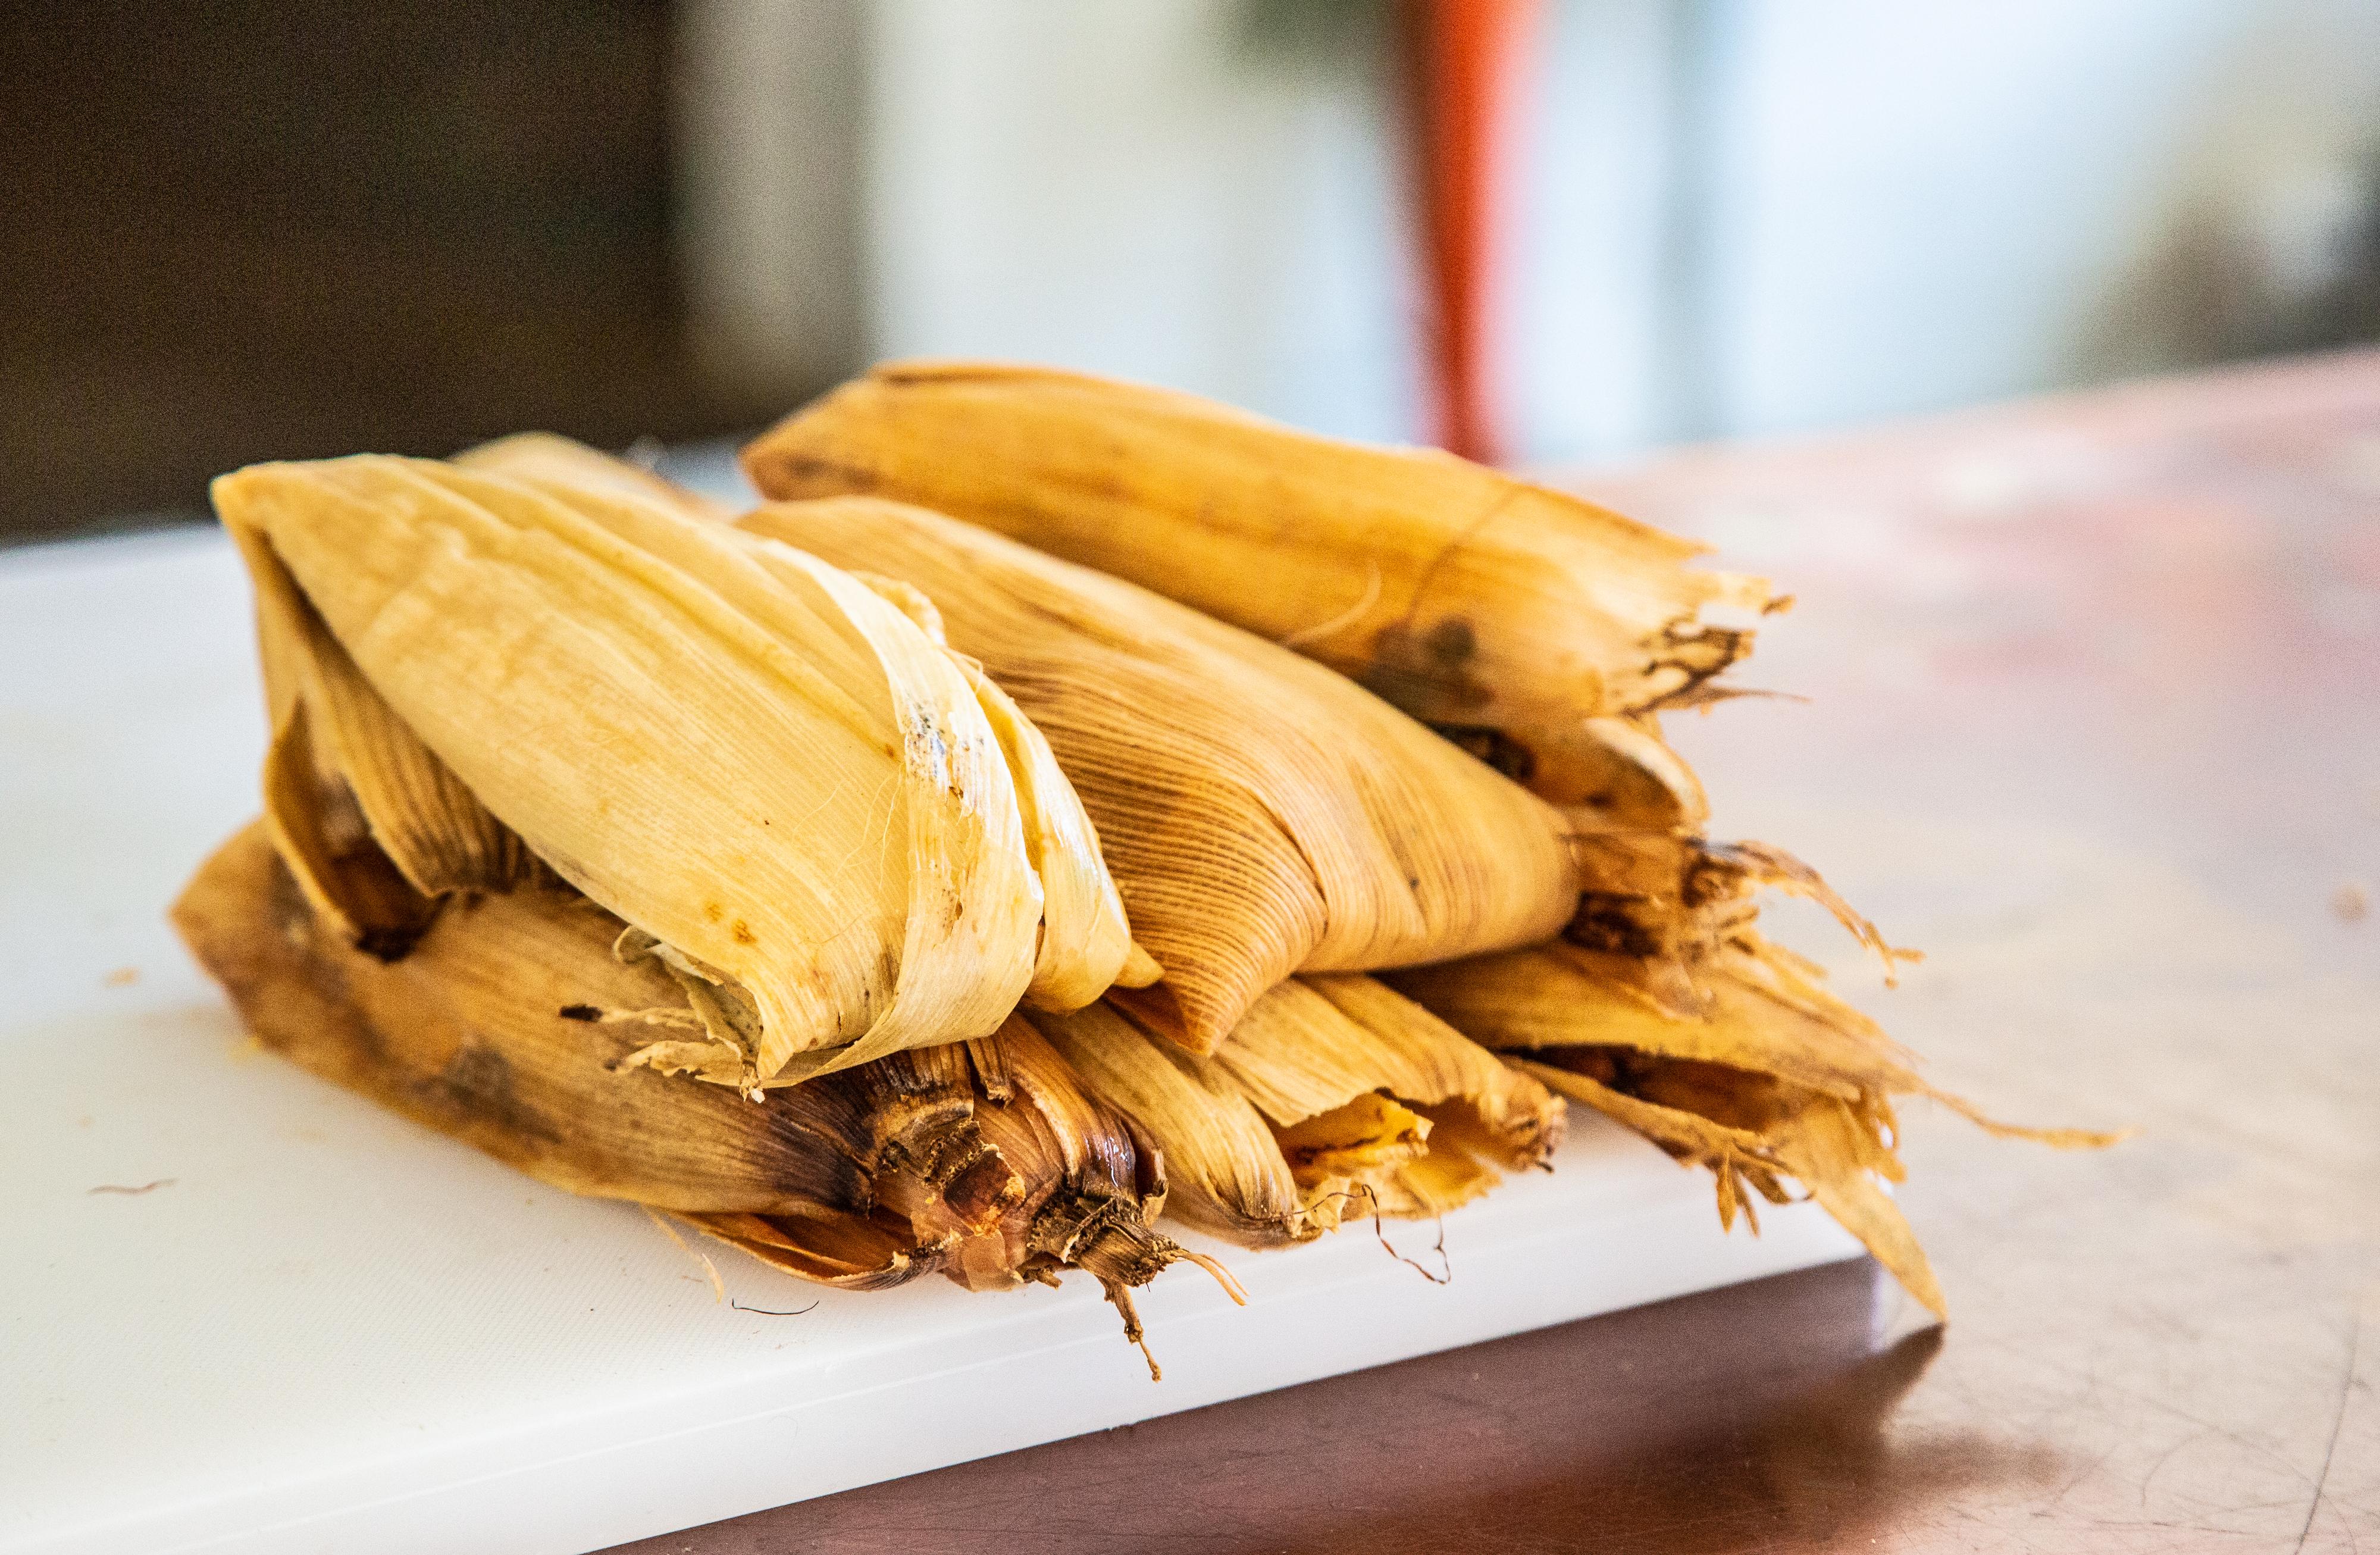 tamala made by chef Maricela Vega